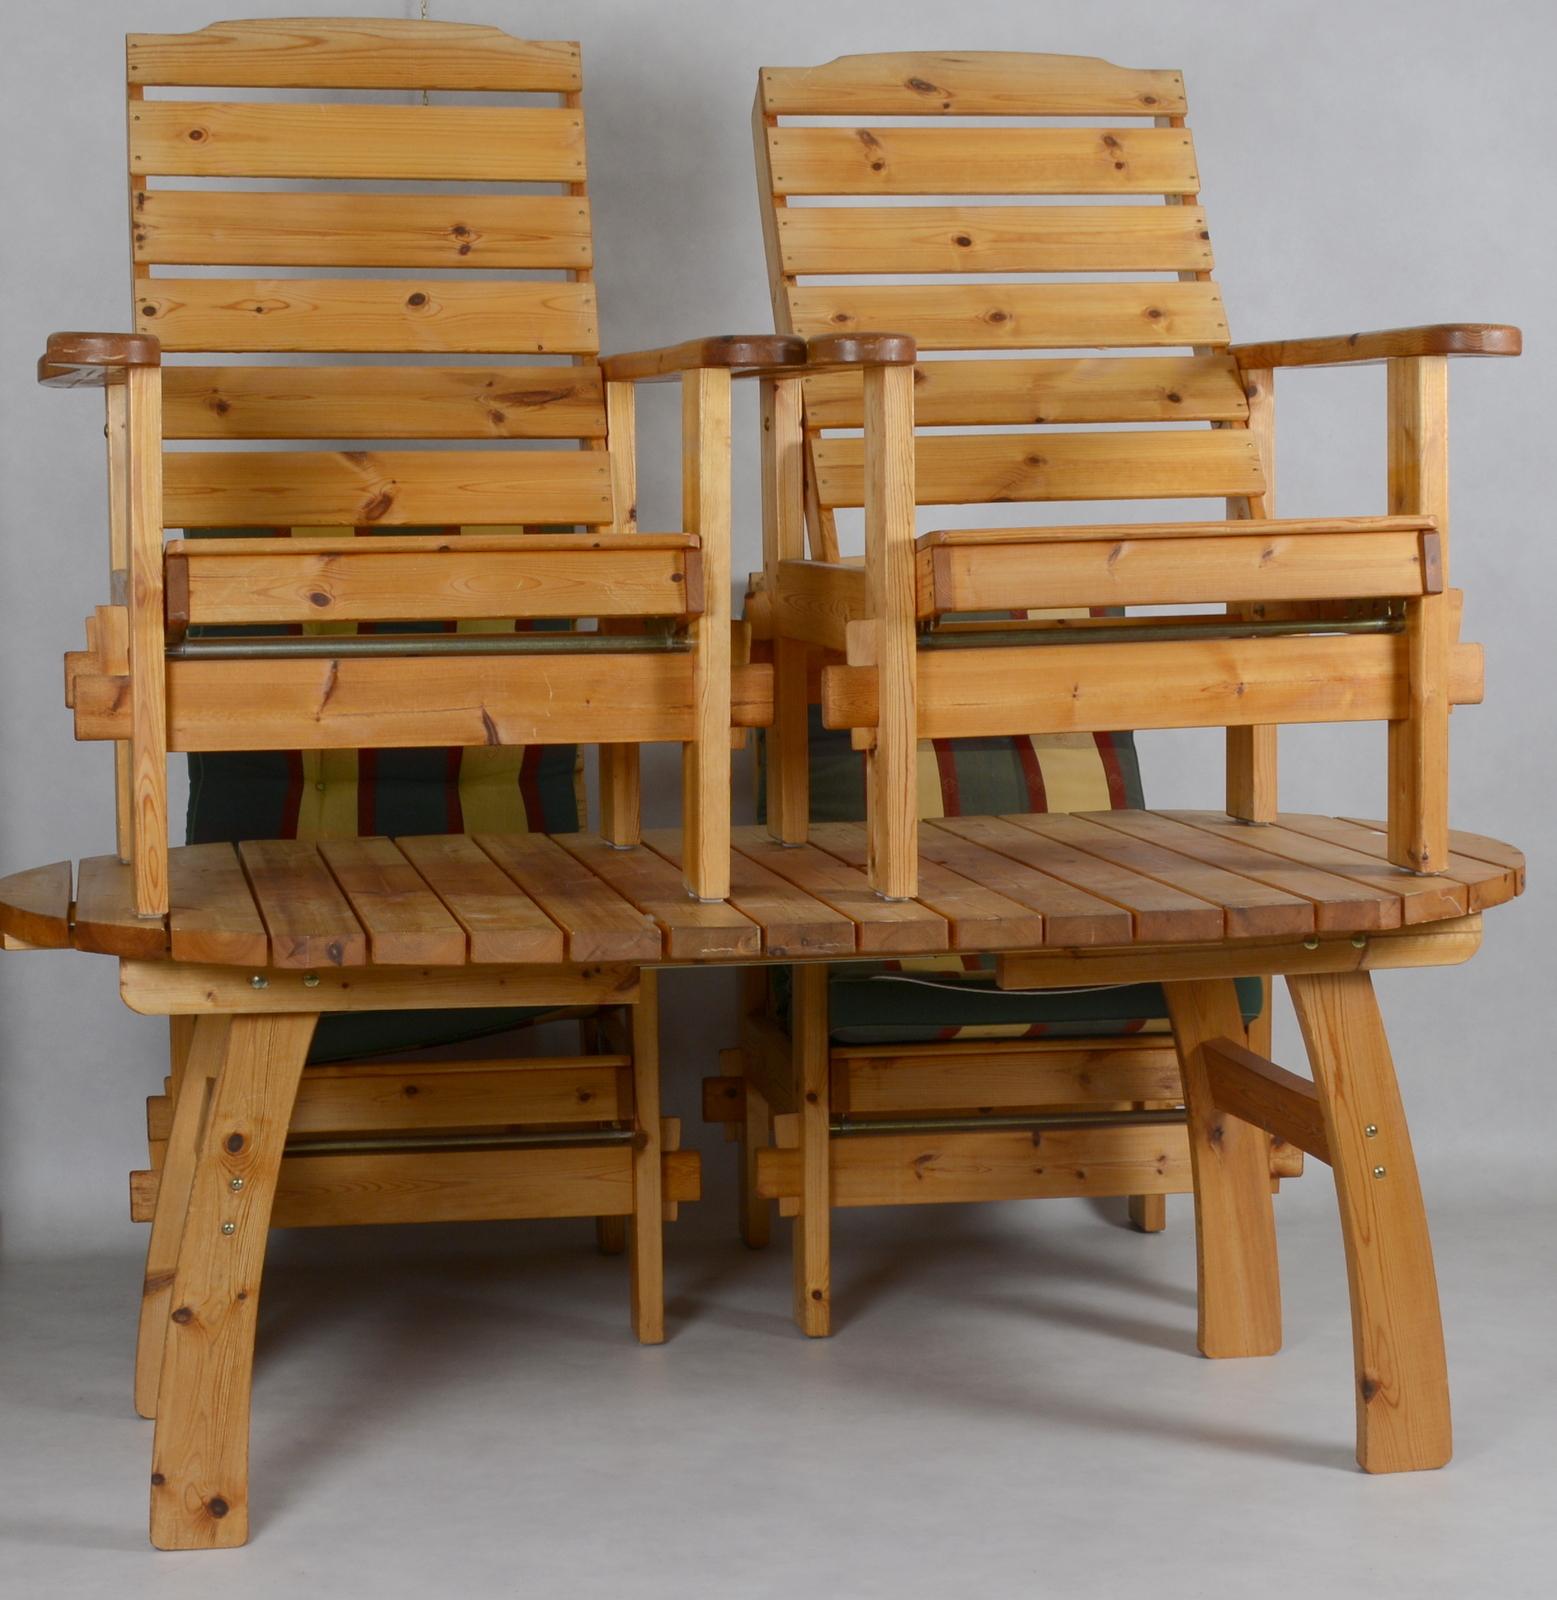 Tradgardsmobler 5 Delar Furniture Garden Furniture Auctionet